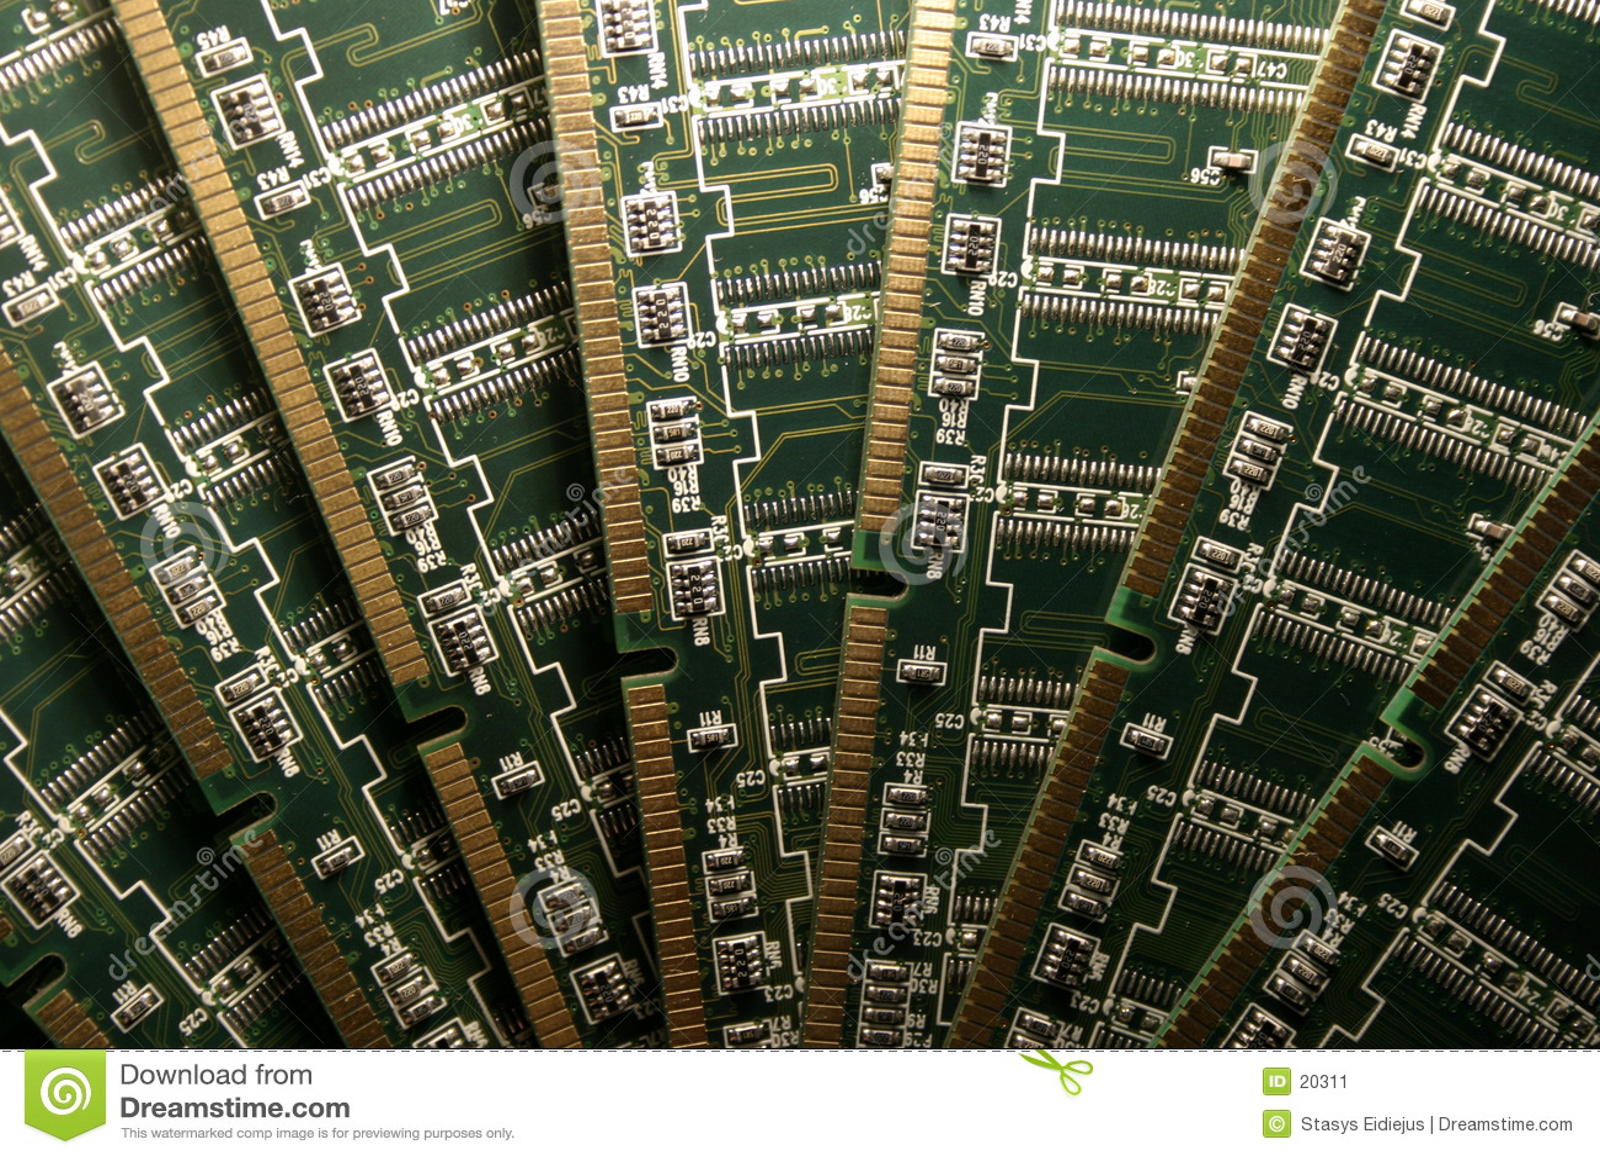 Computer memory modules V